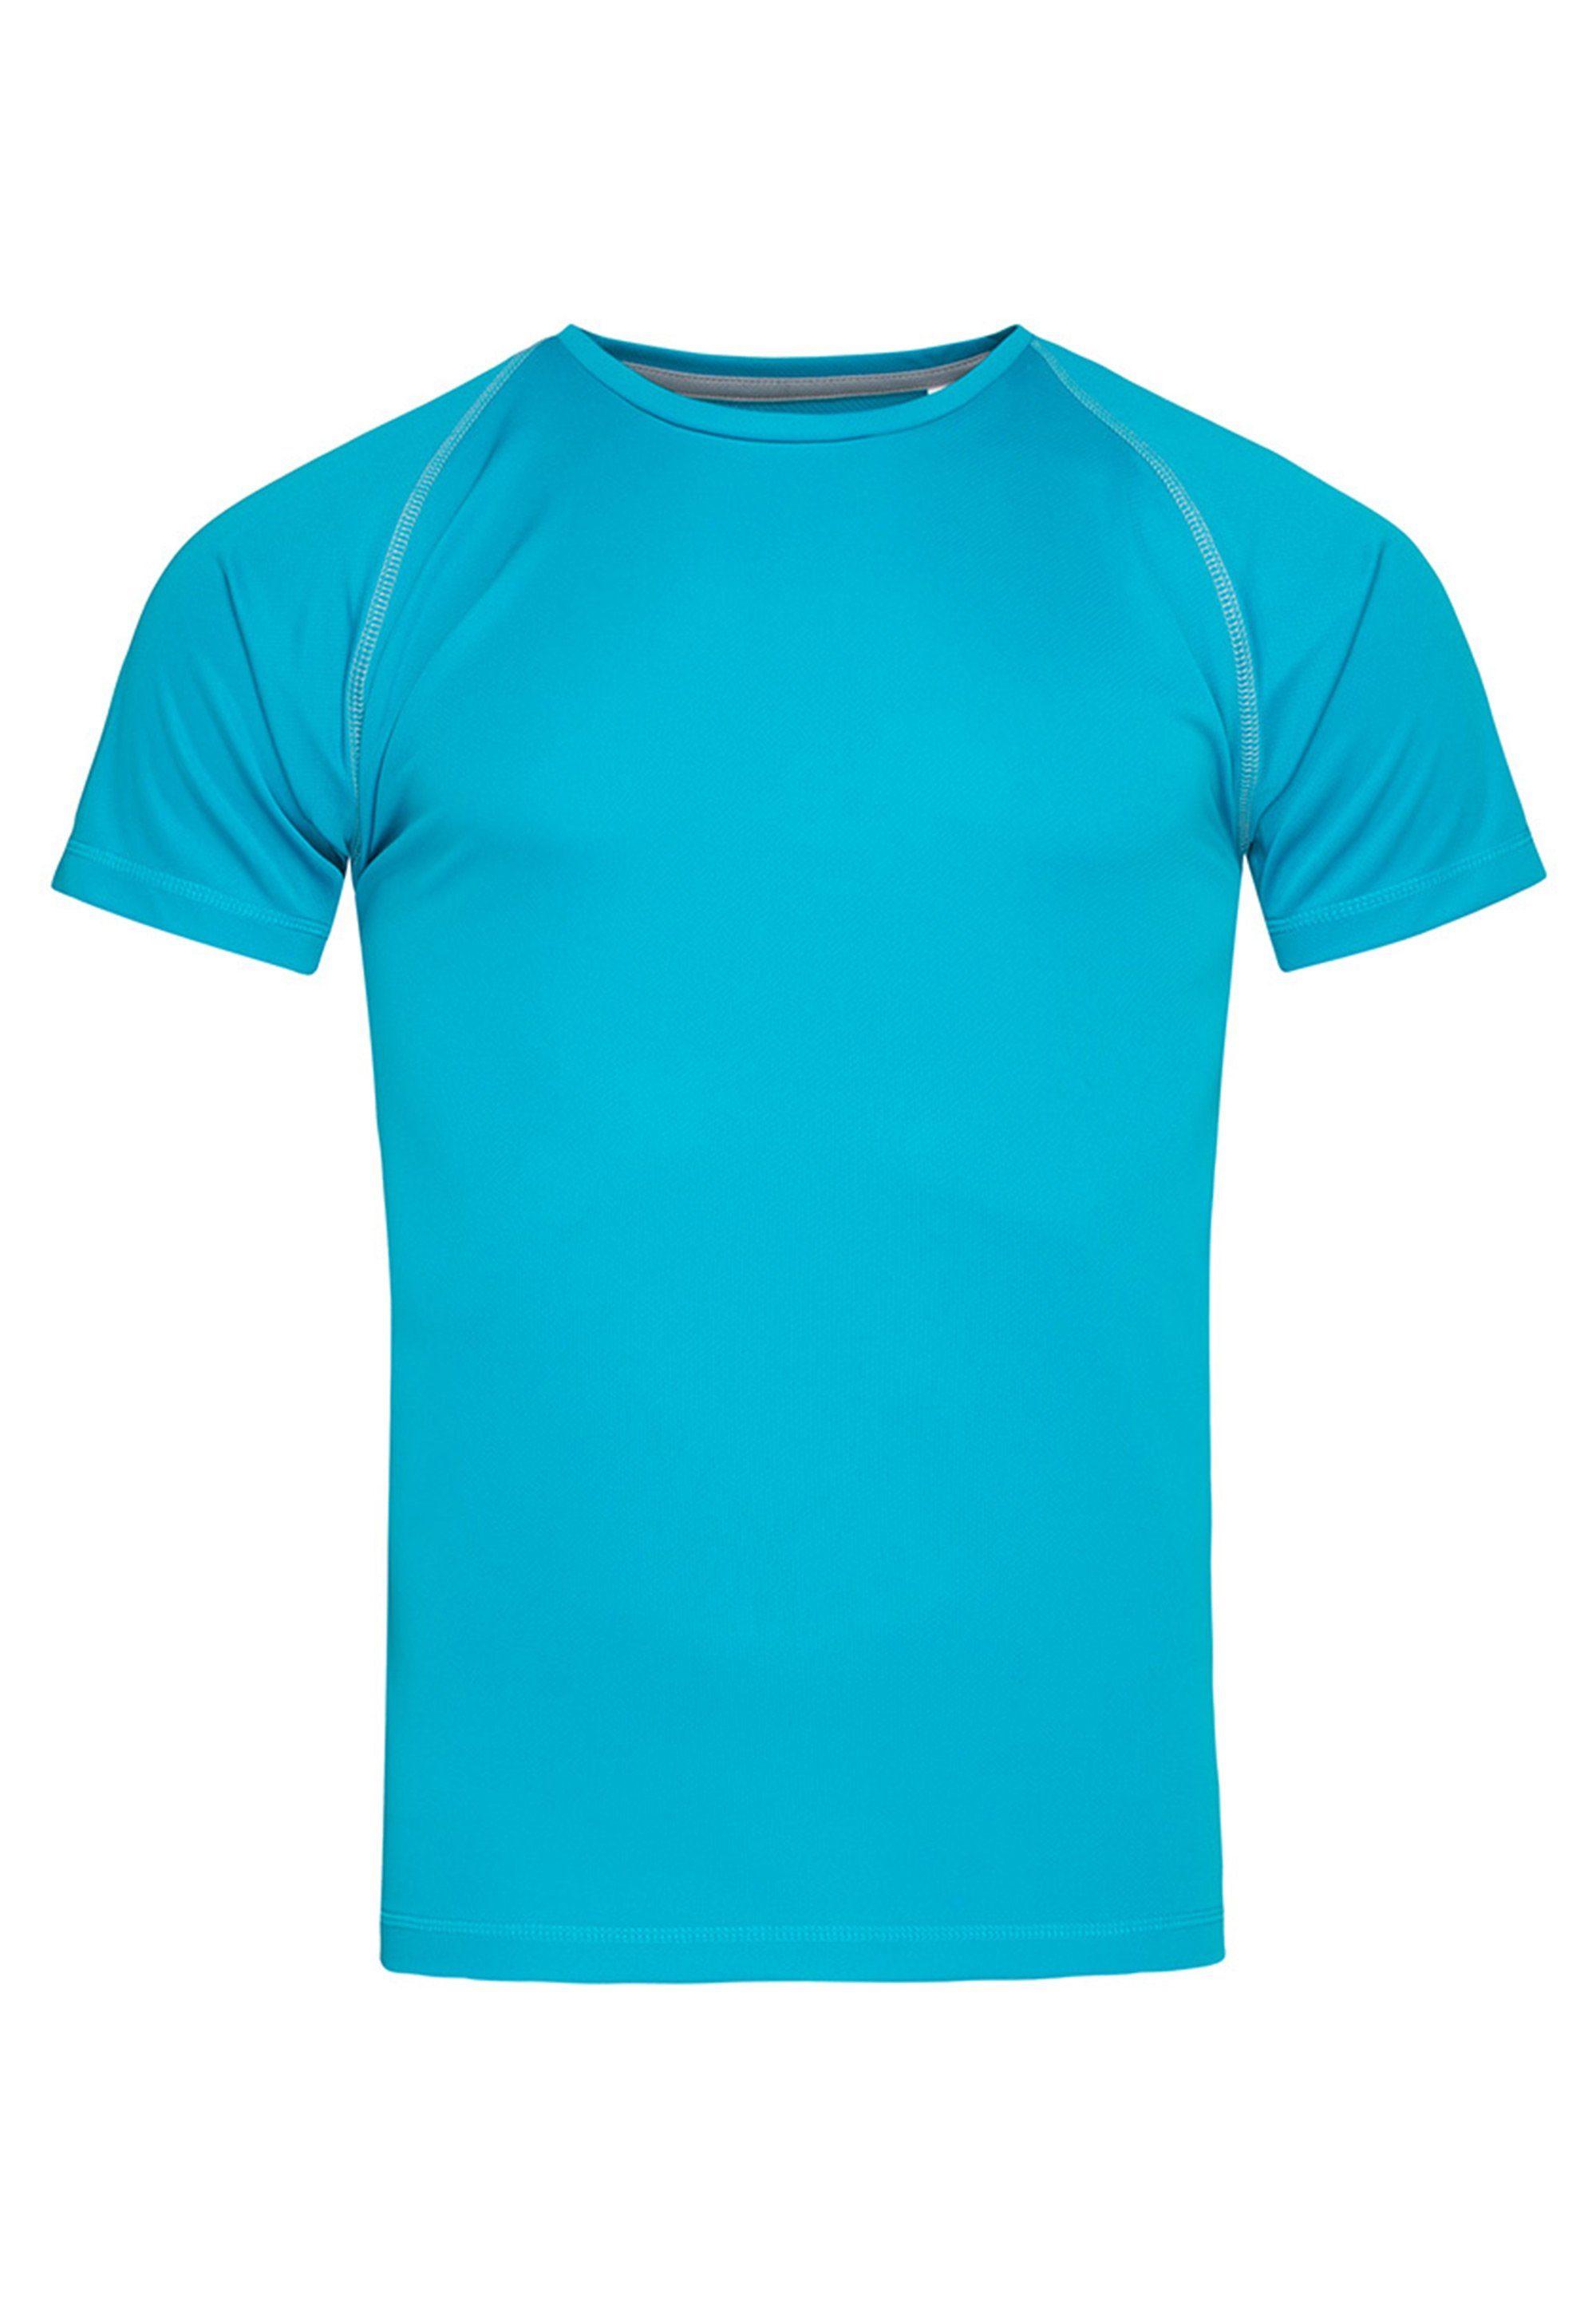 Stedman Sportshirt aus atmungsaktivem Material